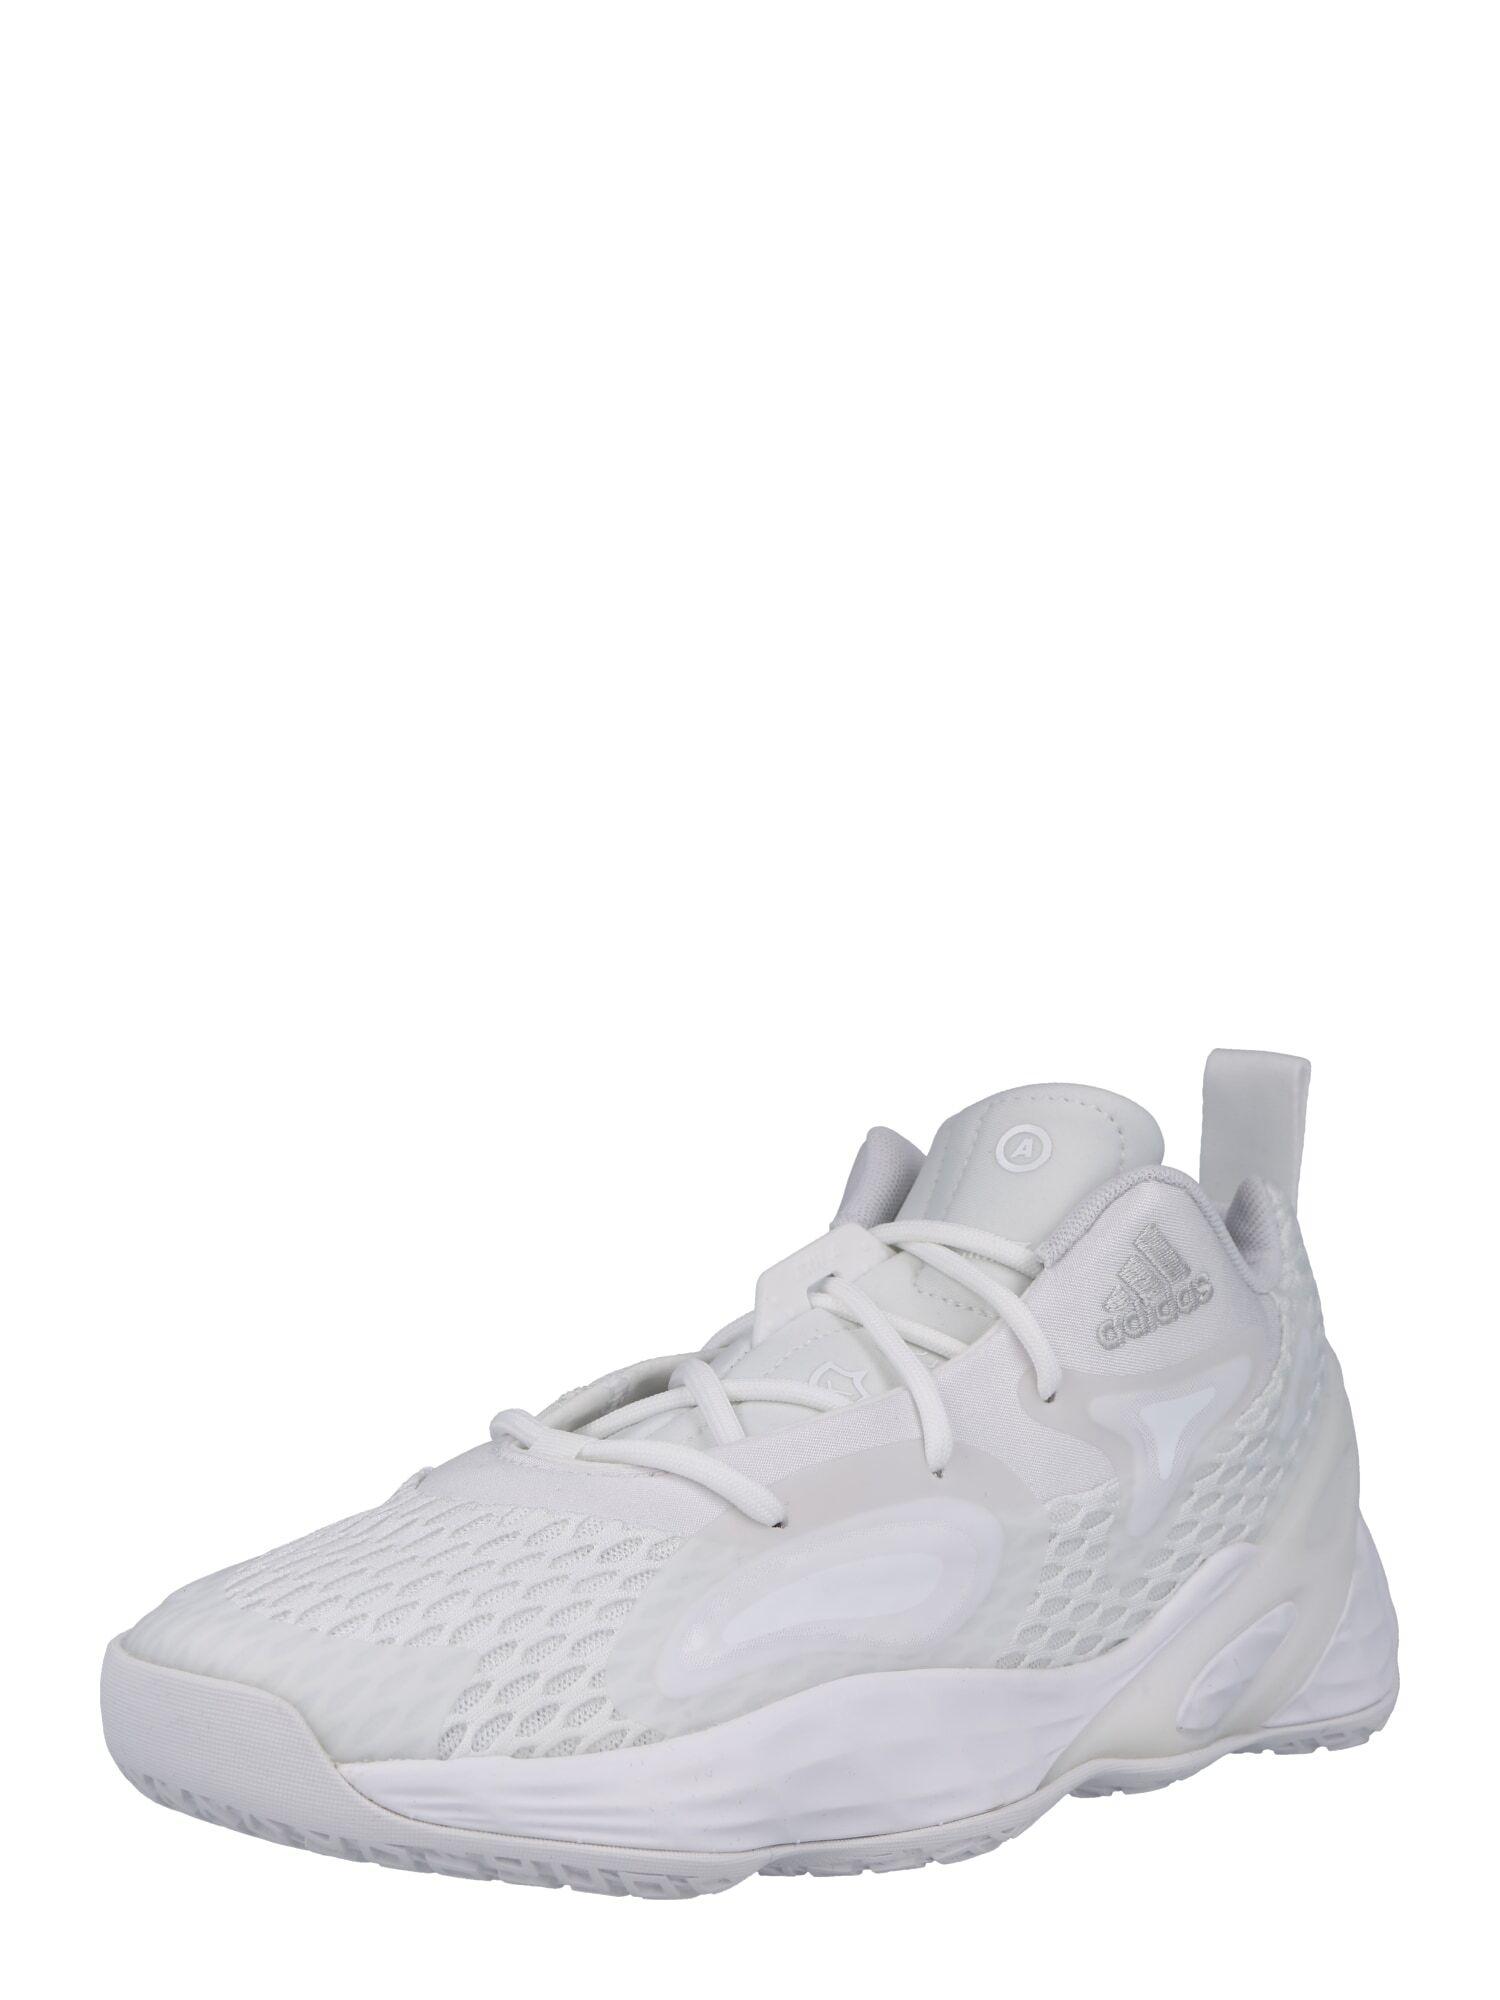 adidas performance scarpa sportiva 'exhibit a' bianco